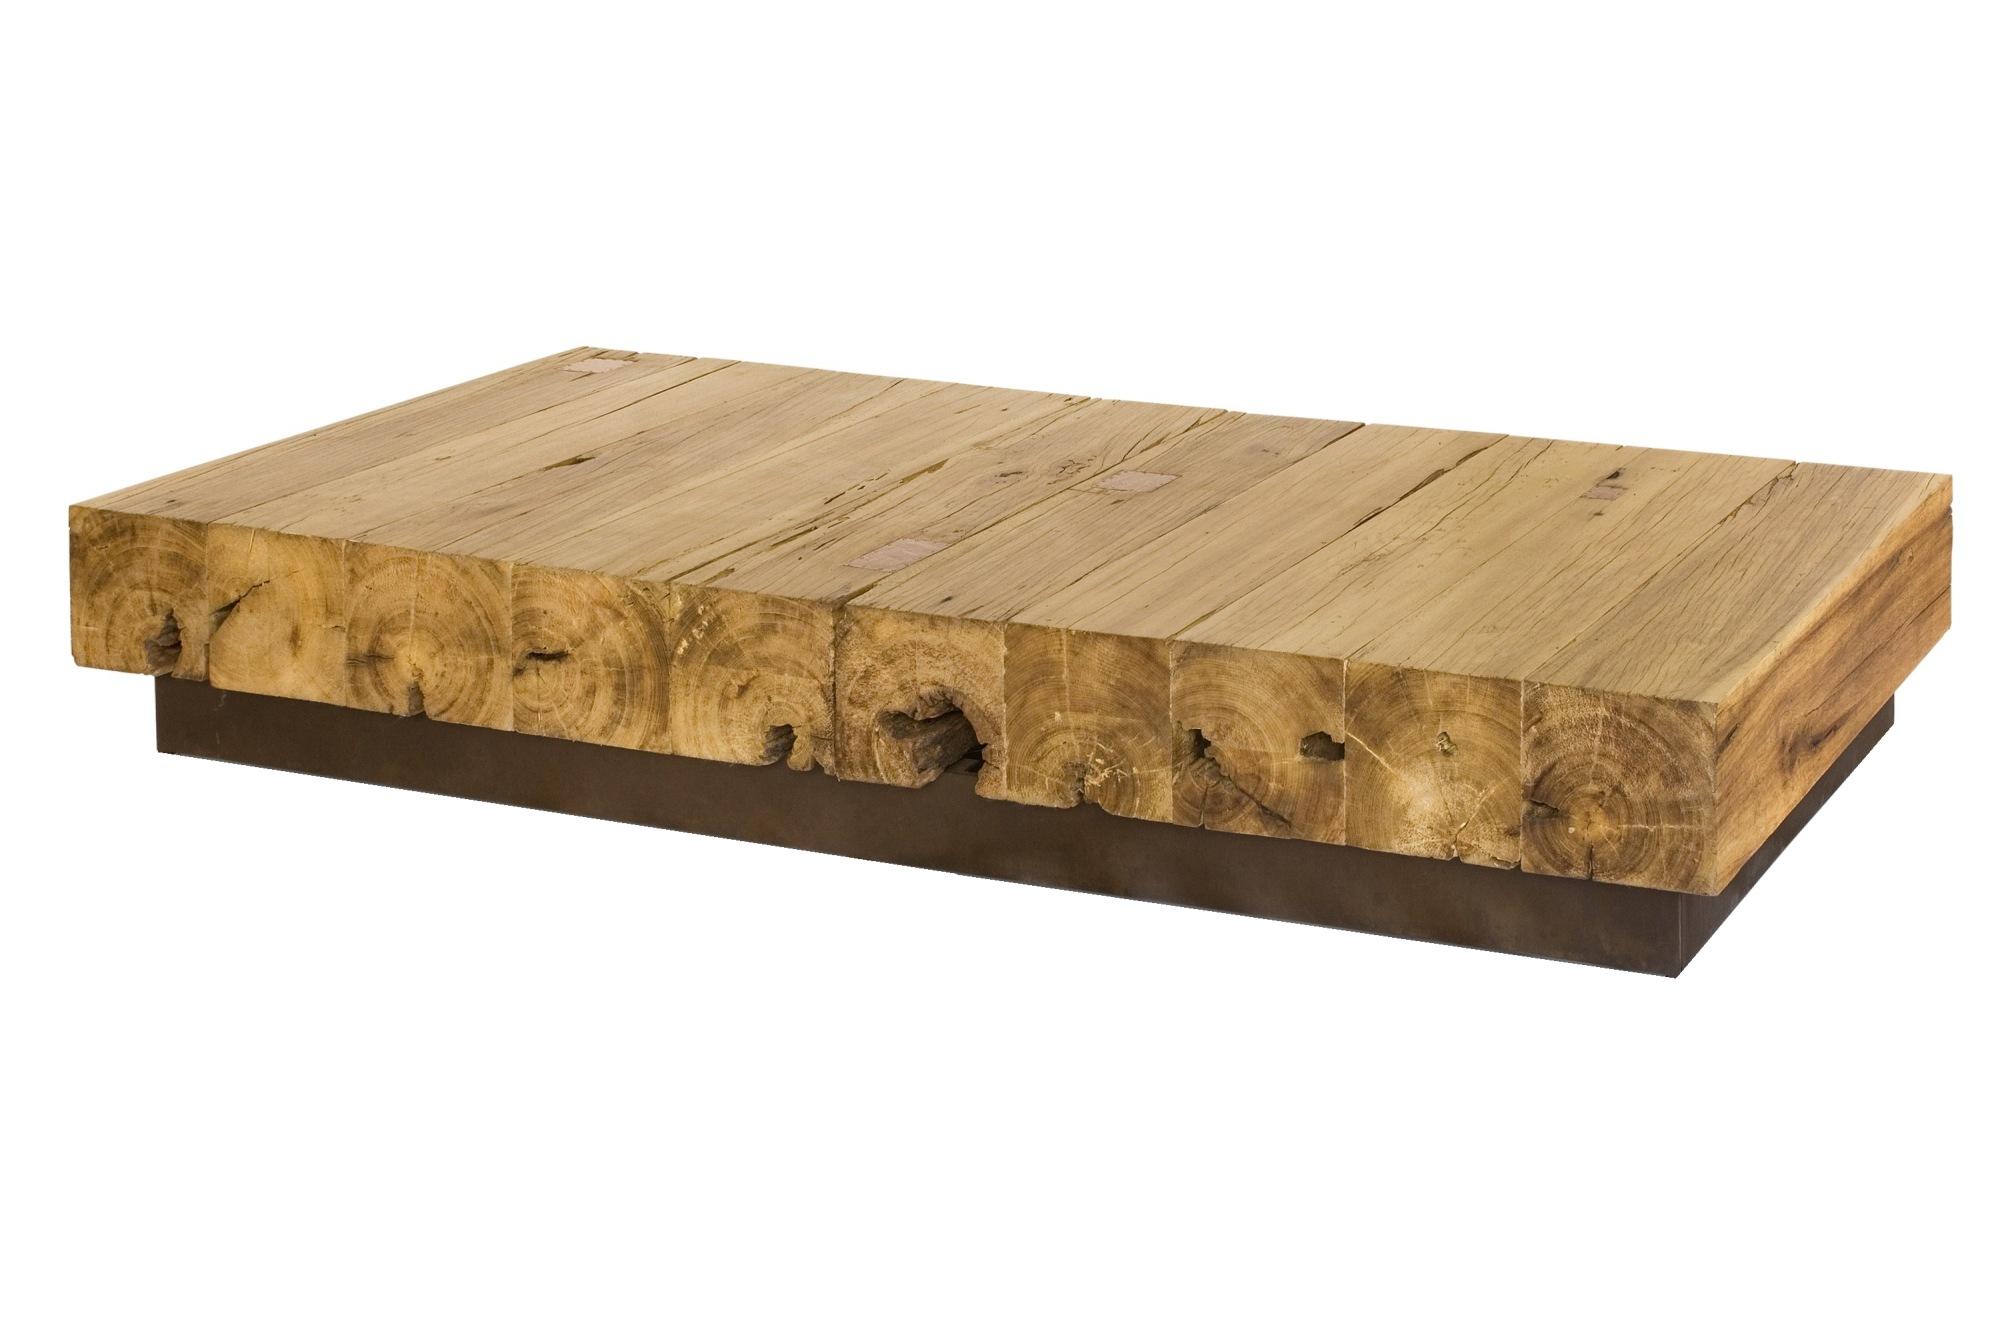 Rotsen Furniture Retalho Coffee Table Reclaimed Wood Coffee Table Cheap Coffee Table Coffee Table Wood [ 1333 x 2000 Pixel ]